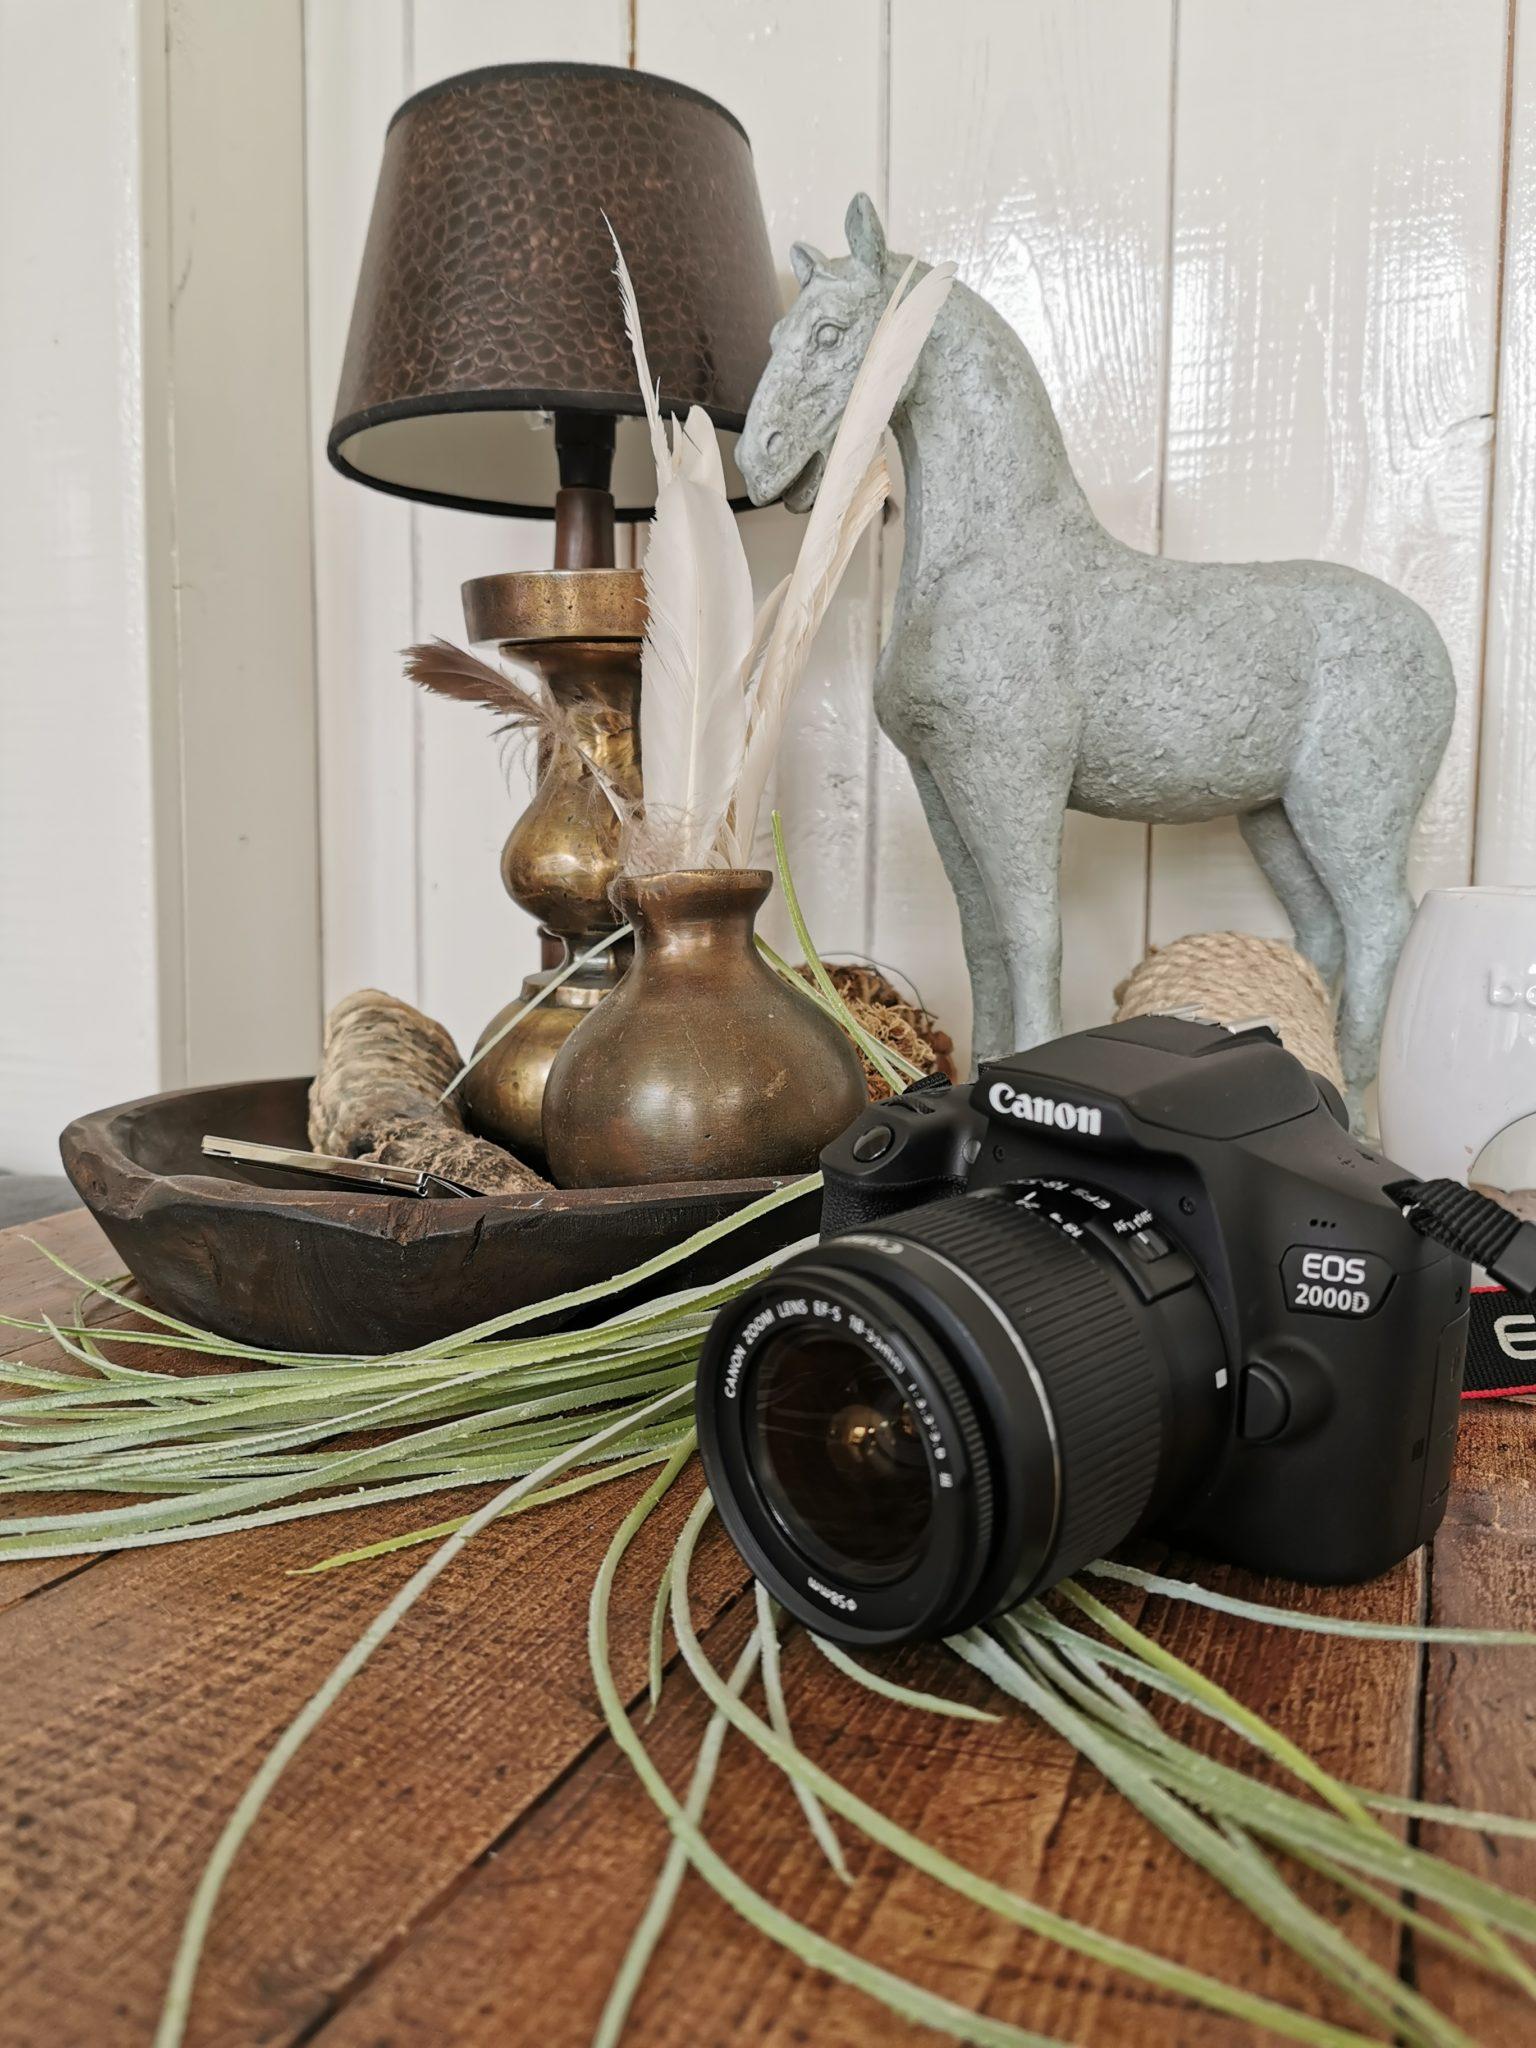 Opleiding woningfotografie afgerond